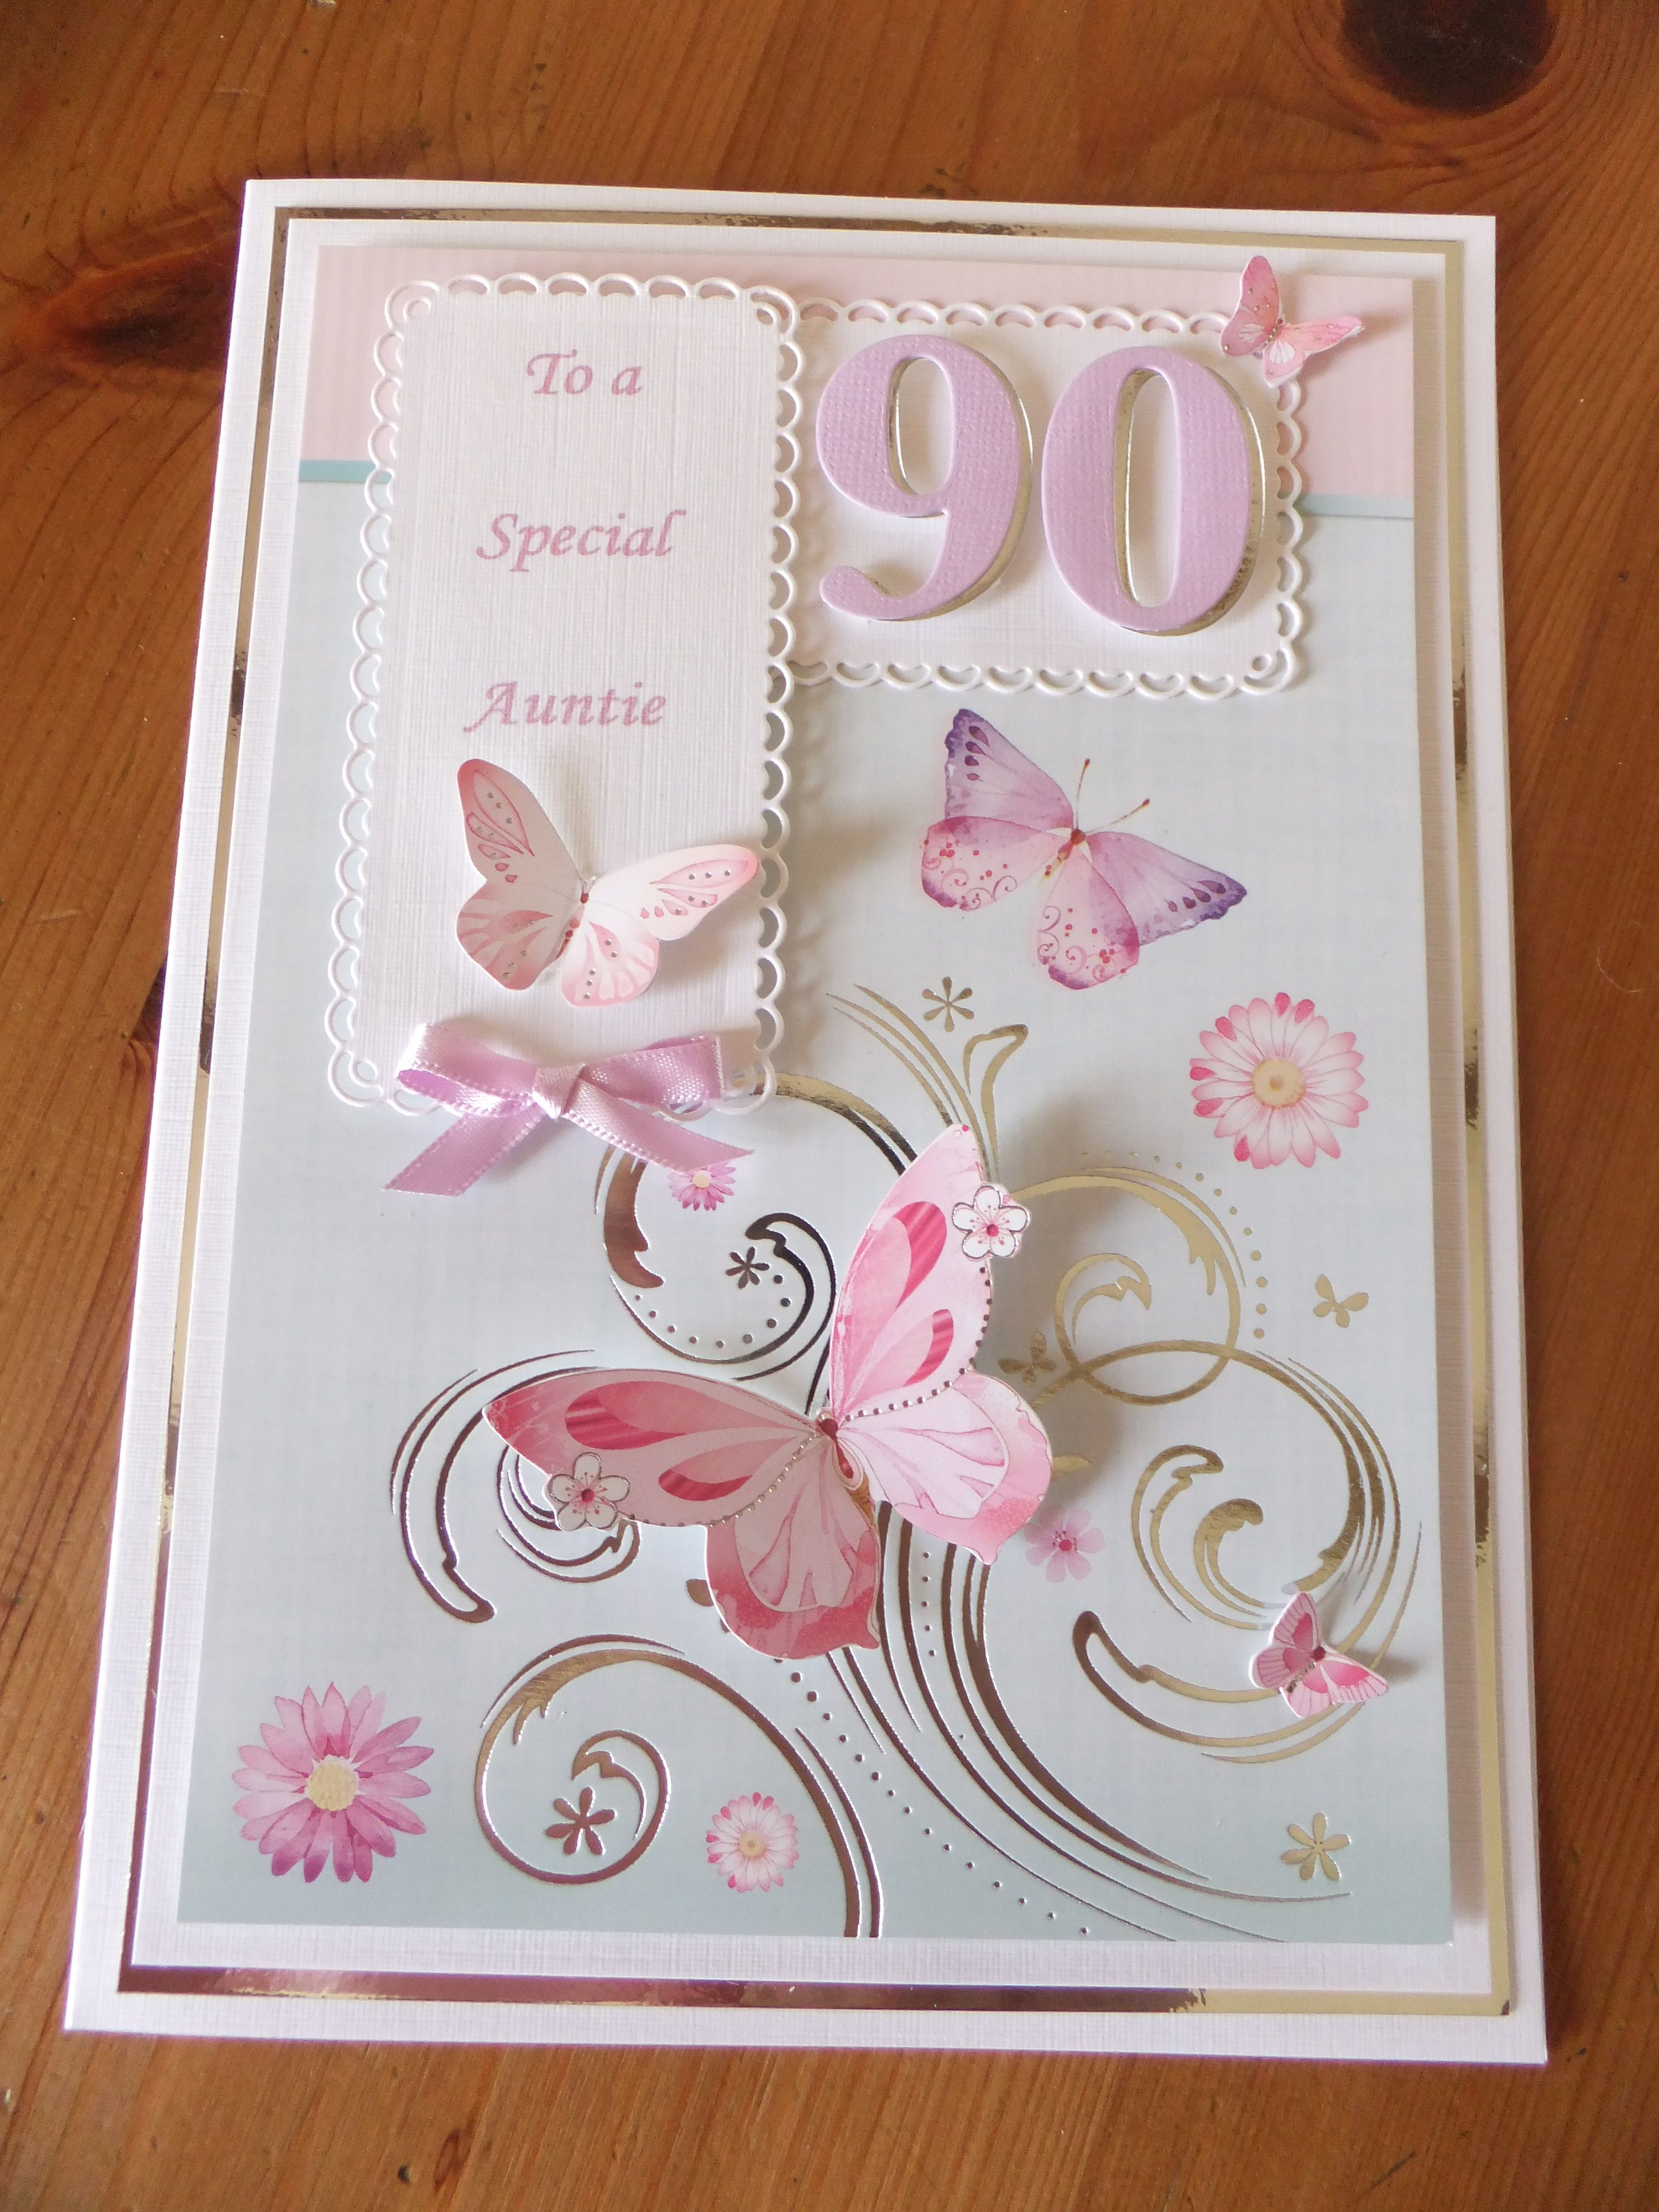 90th birthday hunkydory card & butterflies